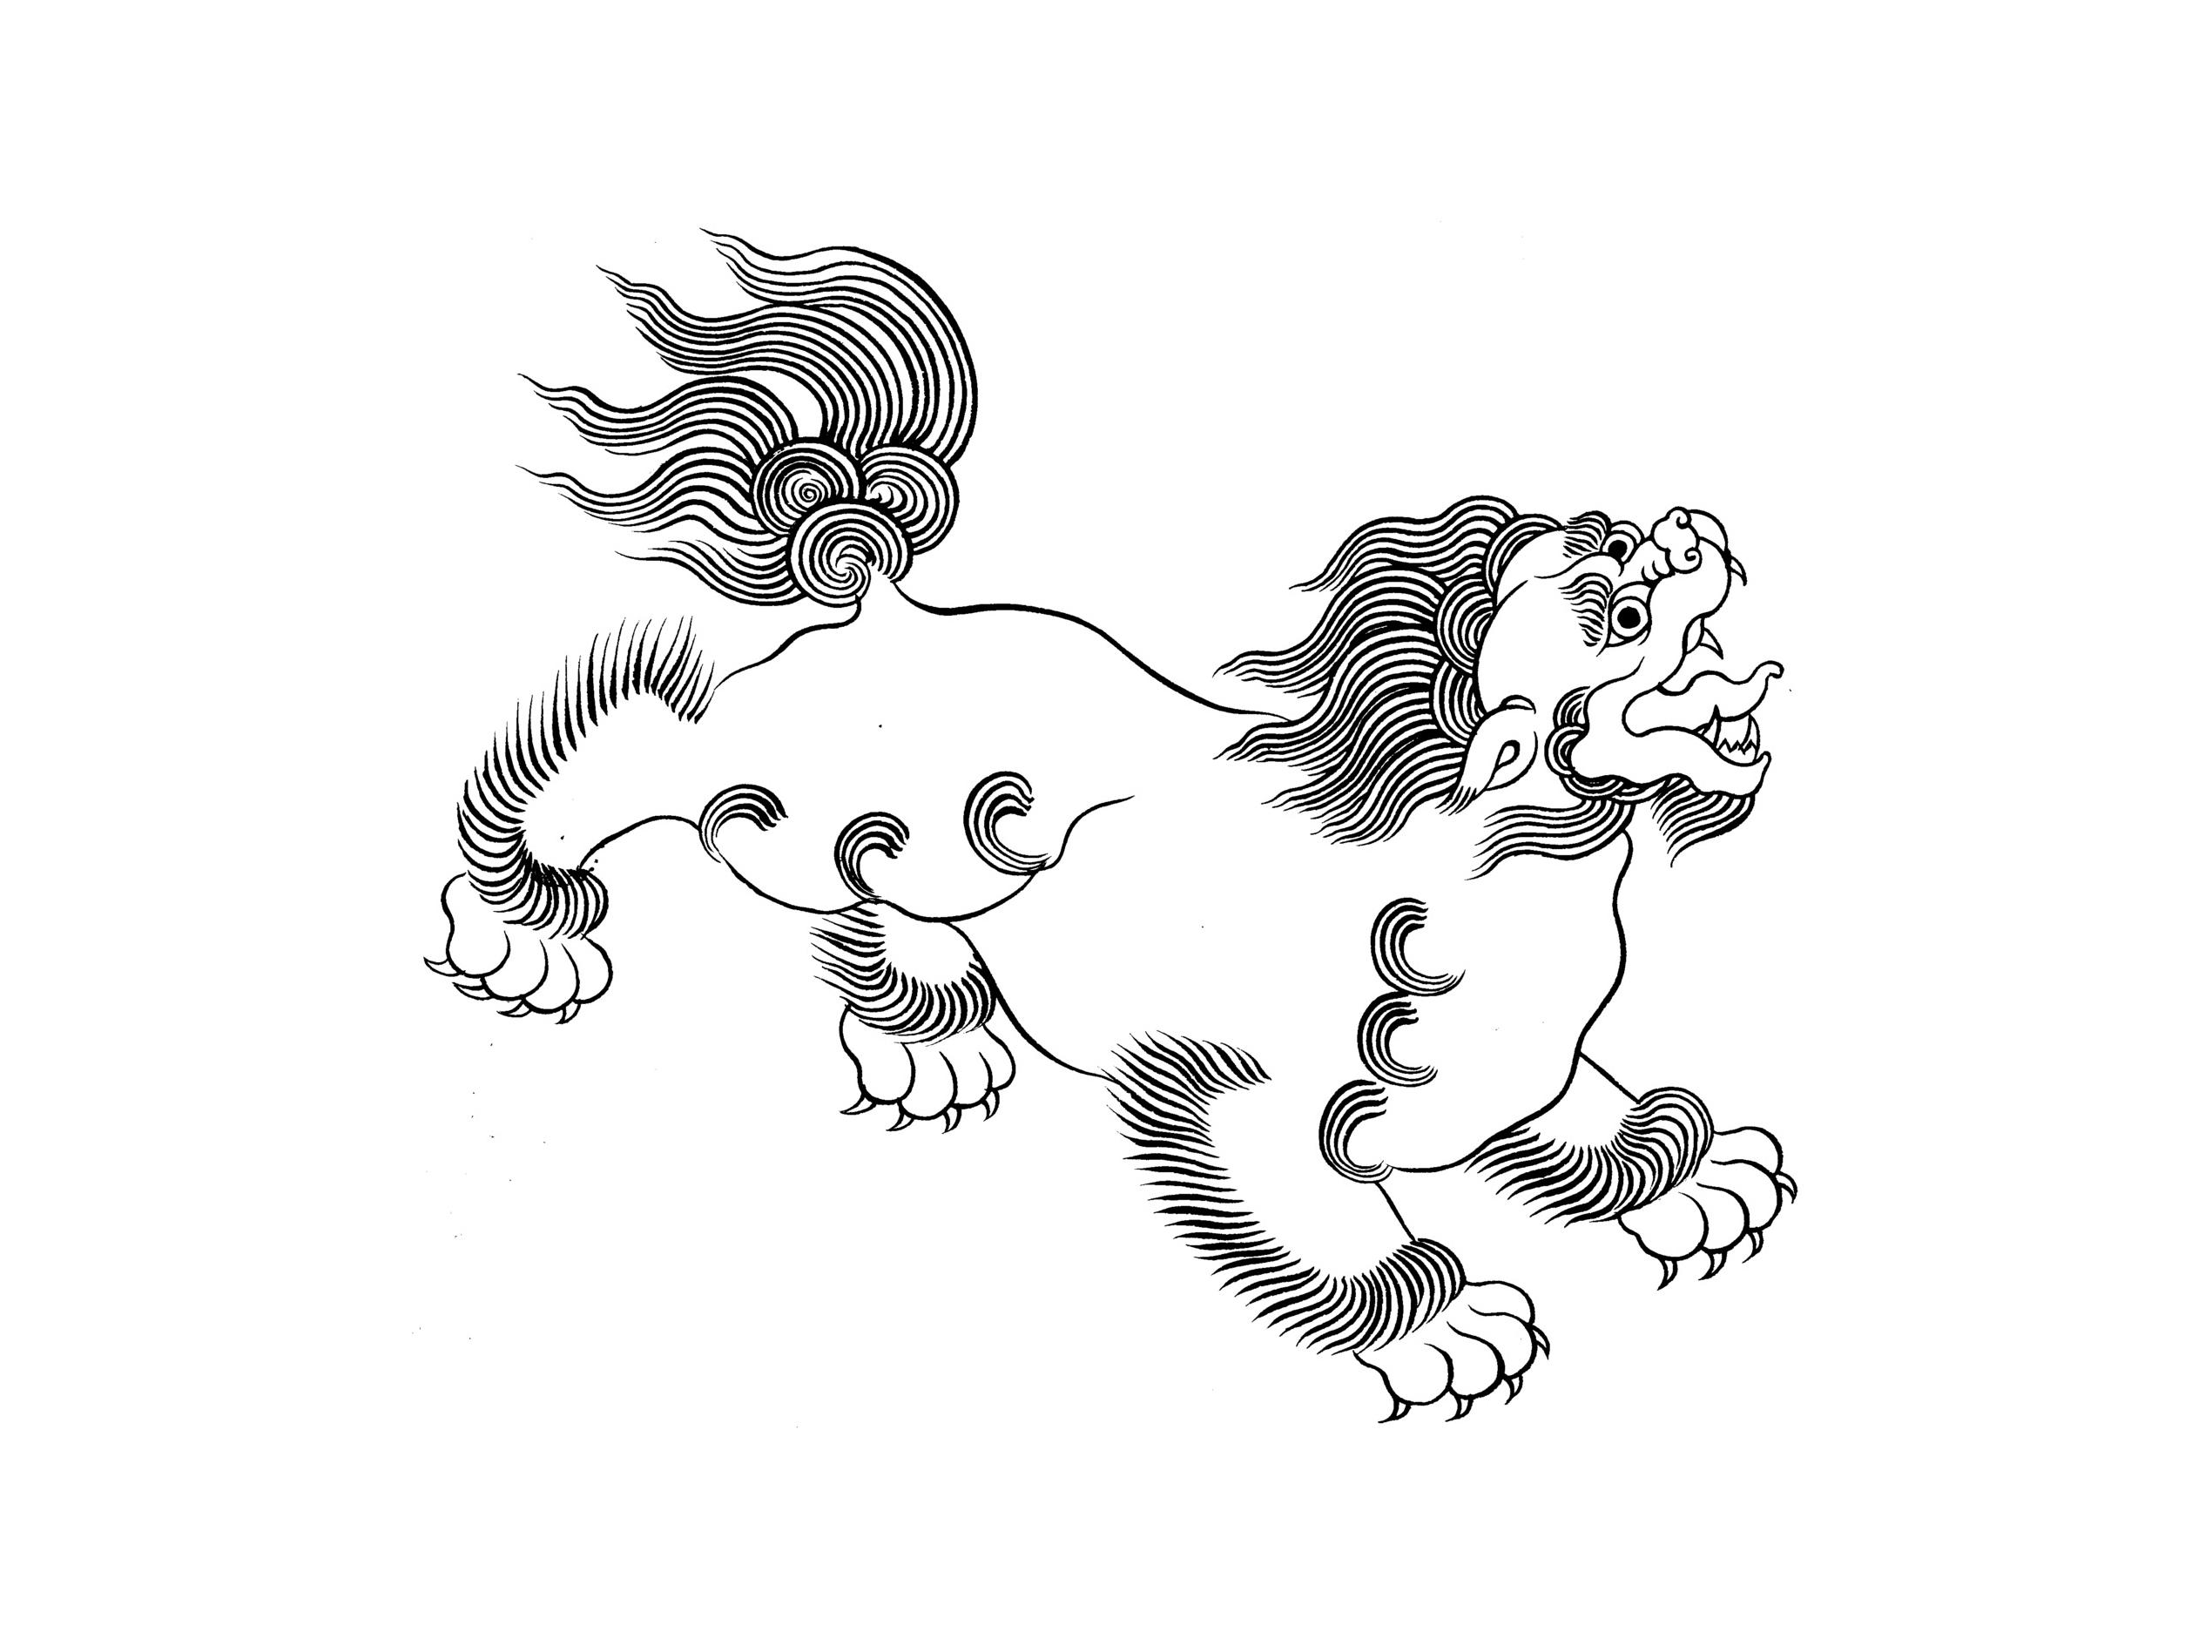 2540x1897 The Tibetan Snow Lion, Inspiration Of Our Namesnowlionsports